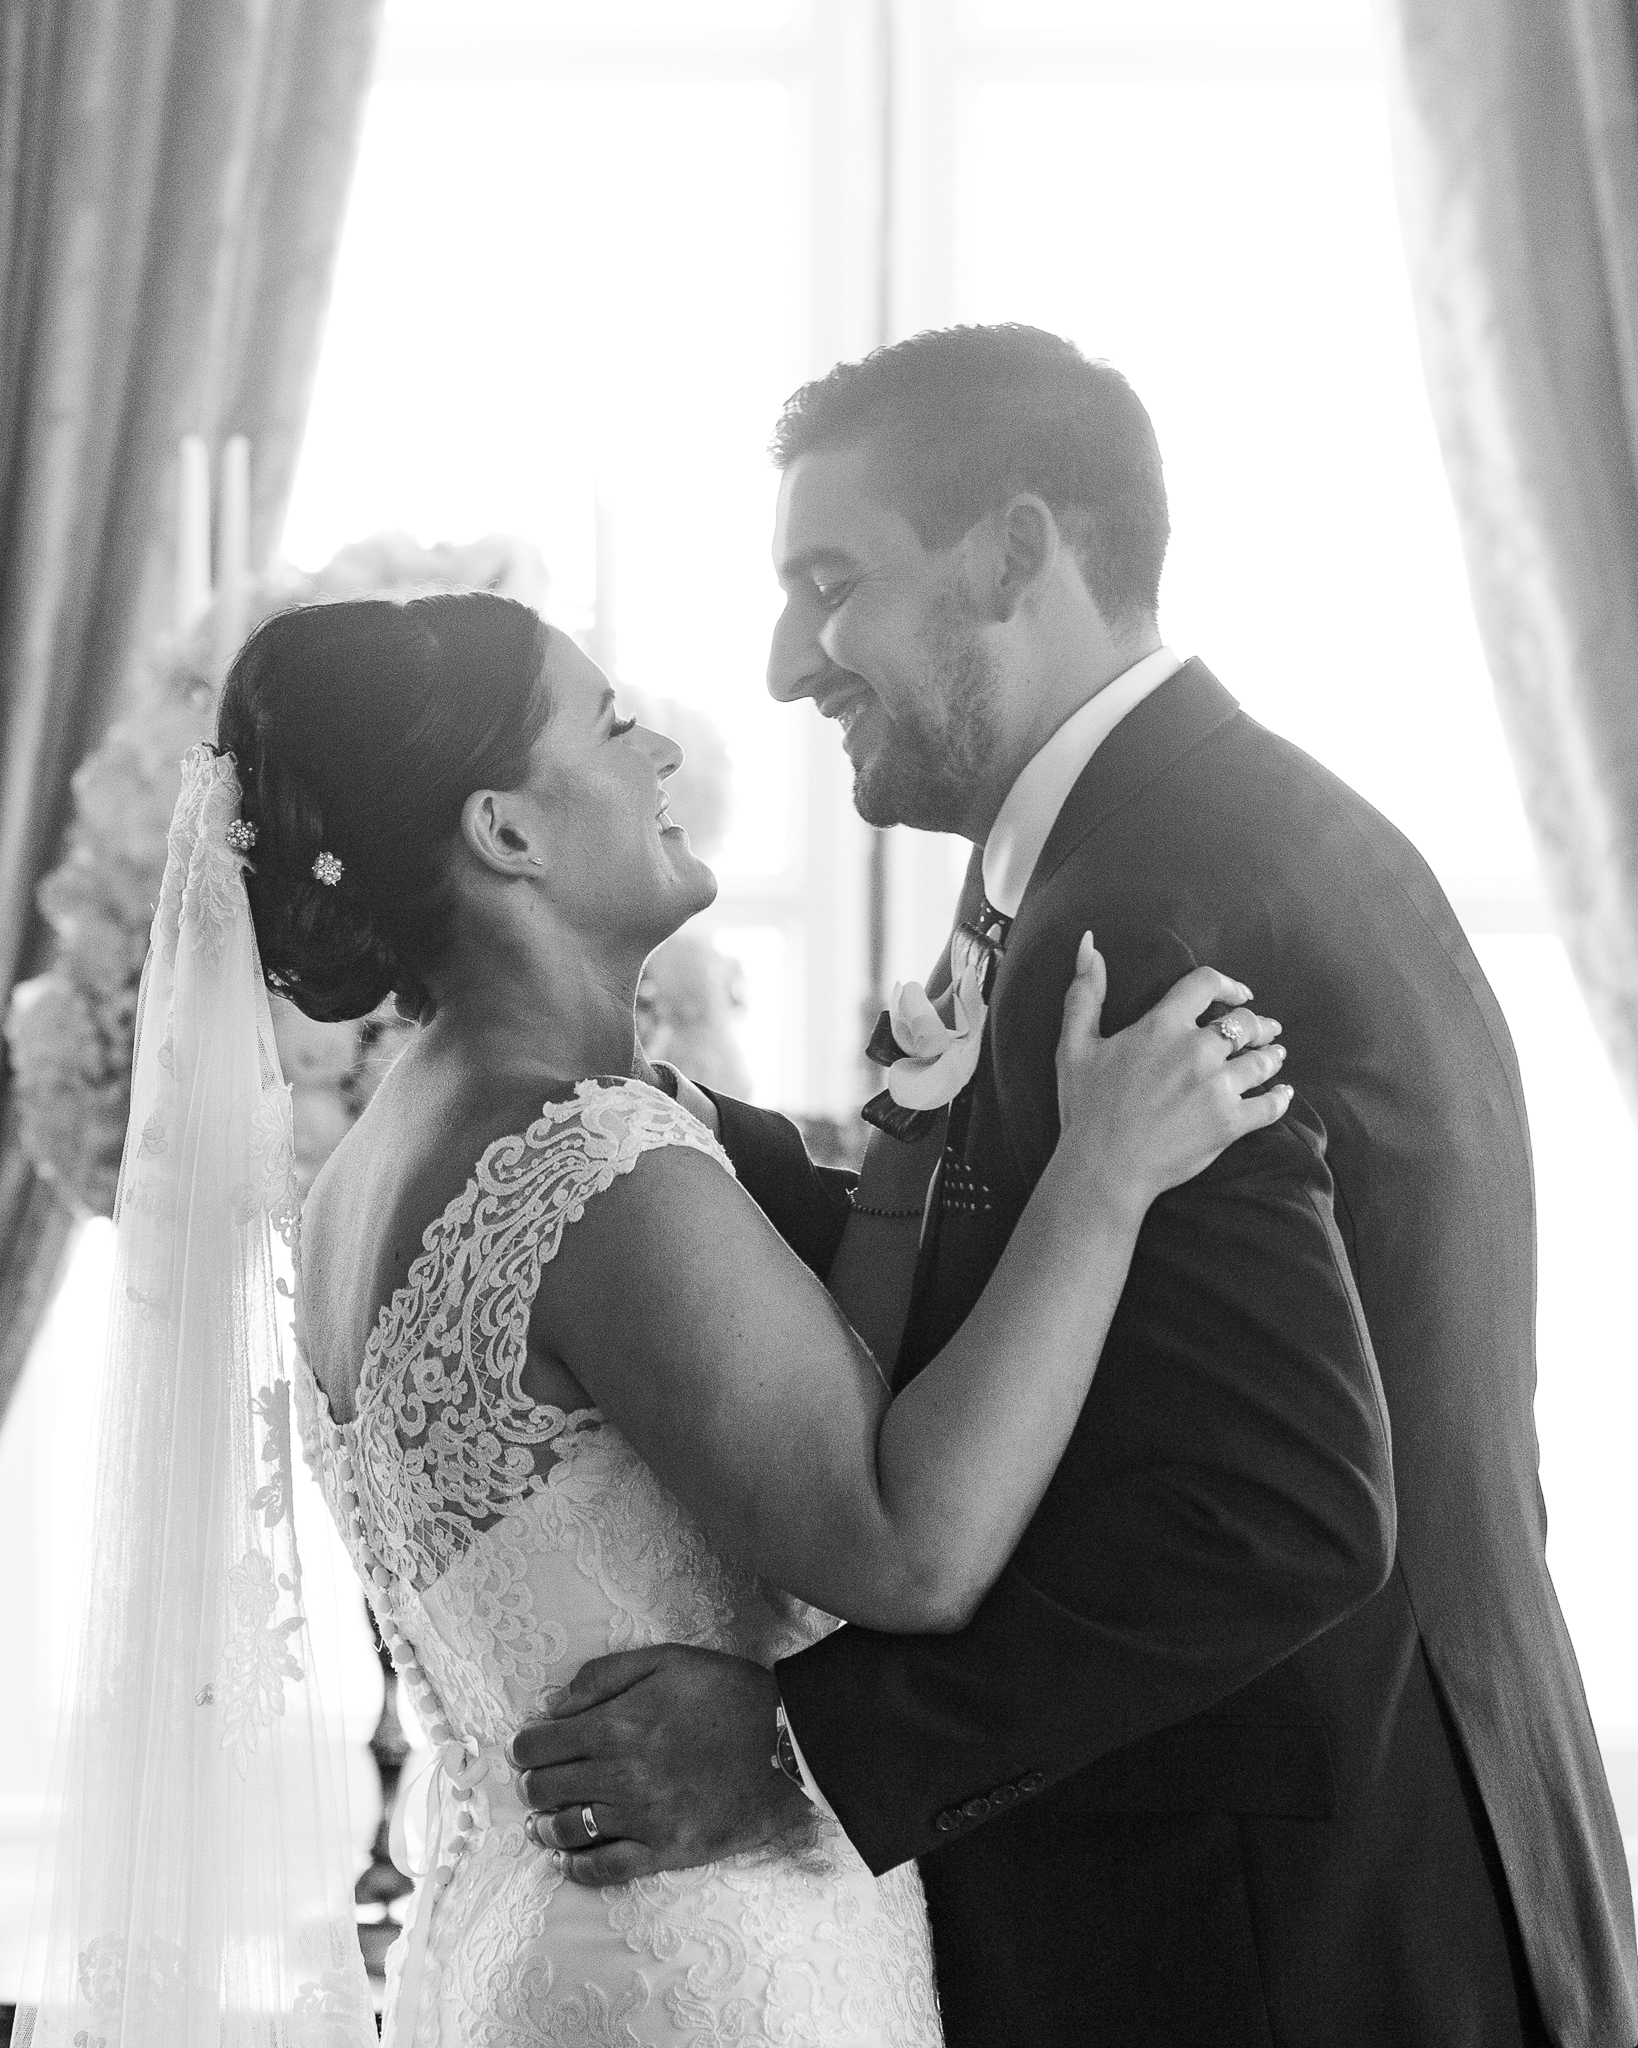 First_Kiss_natural_wedding_photography_Rachel_Thornhill_Photographer